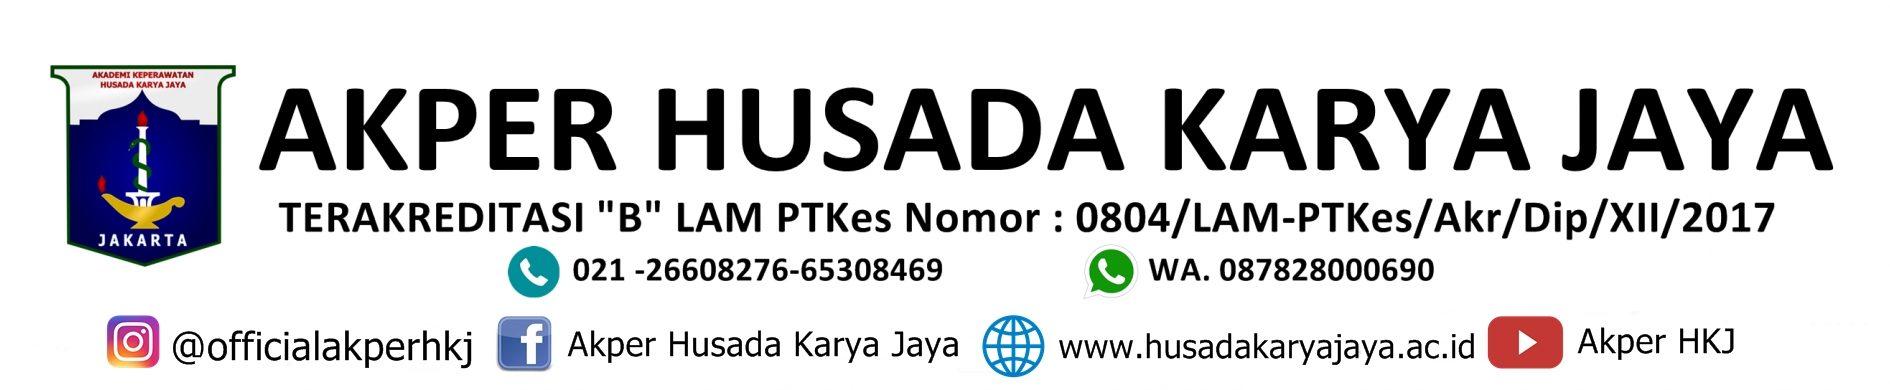 Selamat Datang Di Website Akper Husada Karya Jaya